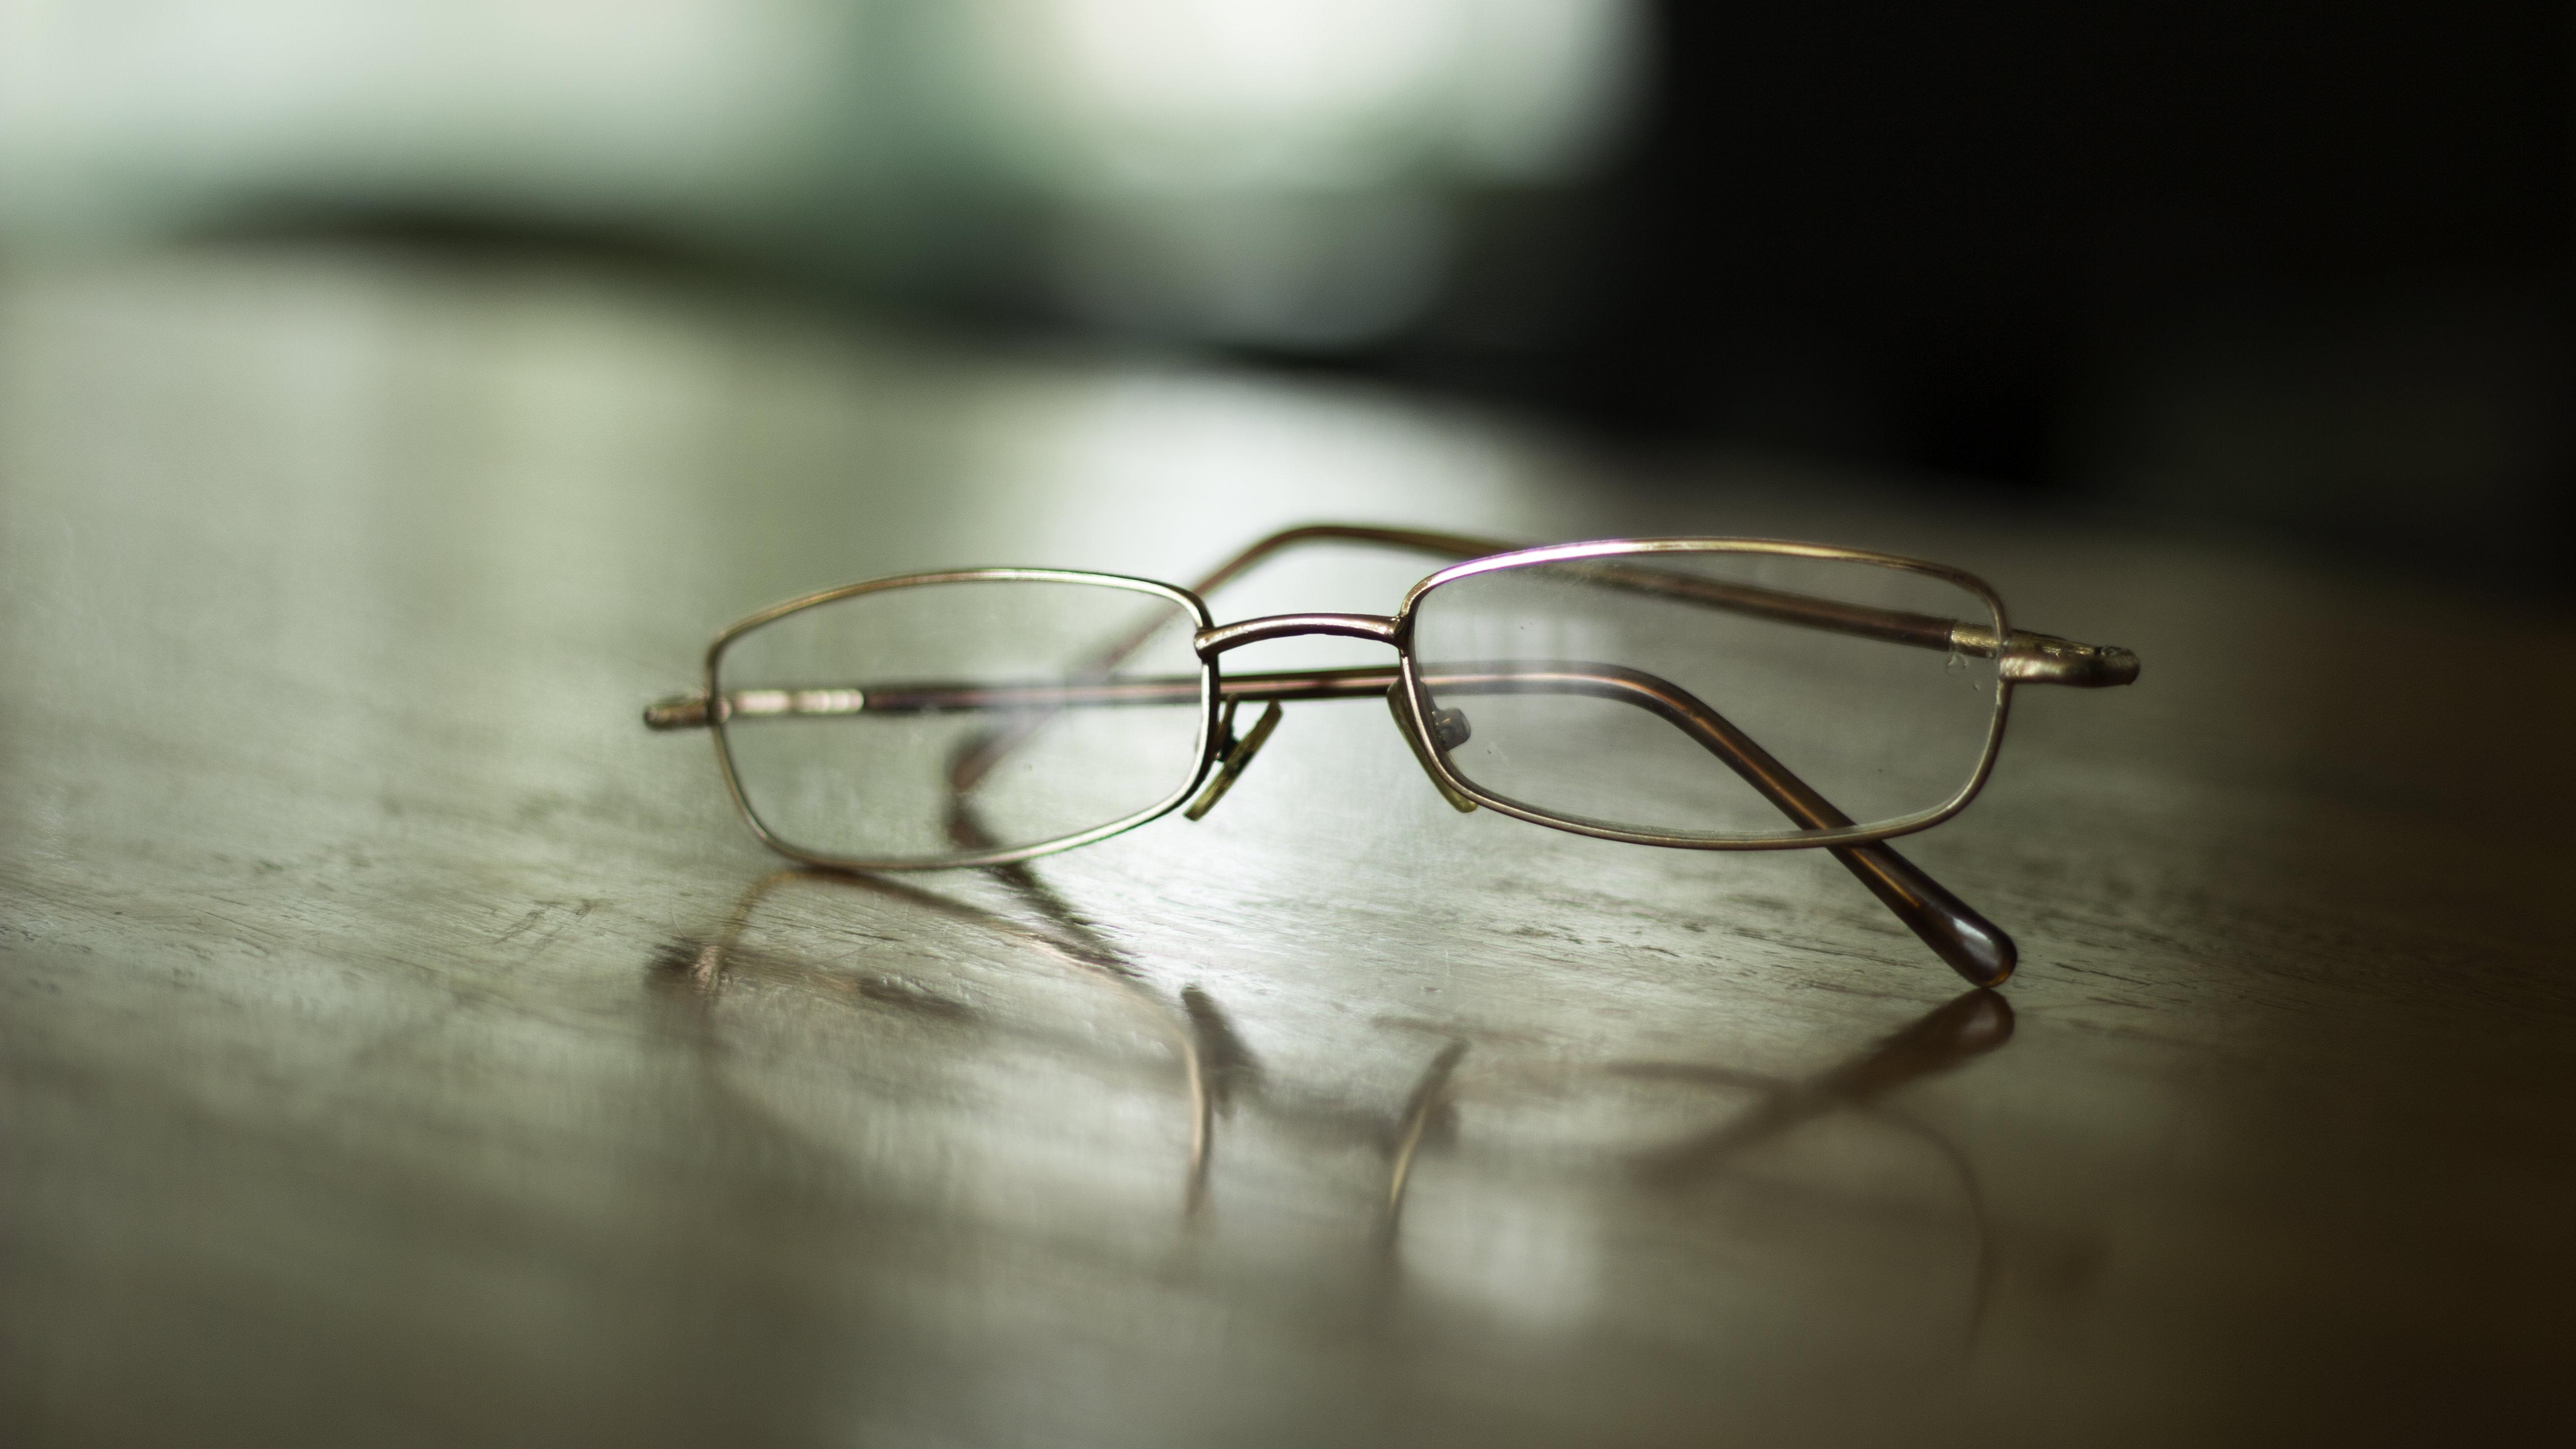 Eyeglasses are like teaching emotional intelligence skills in schools.